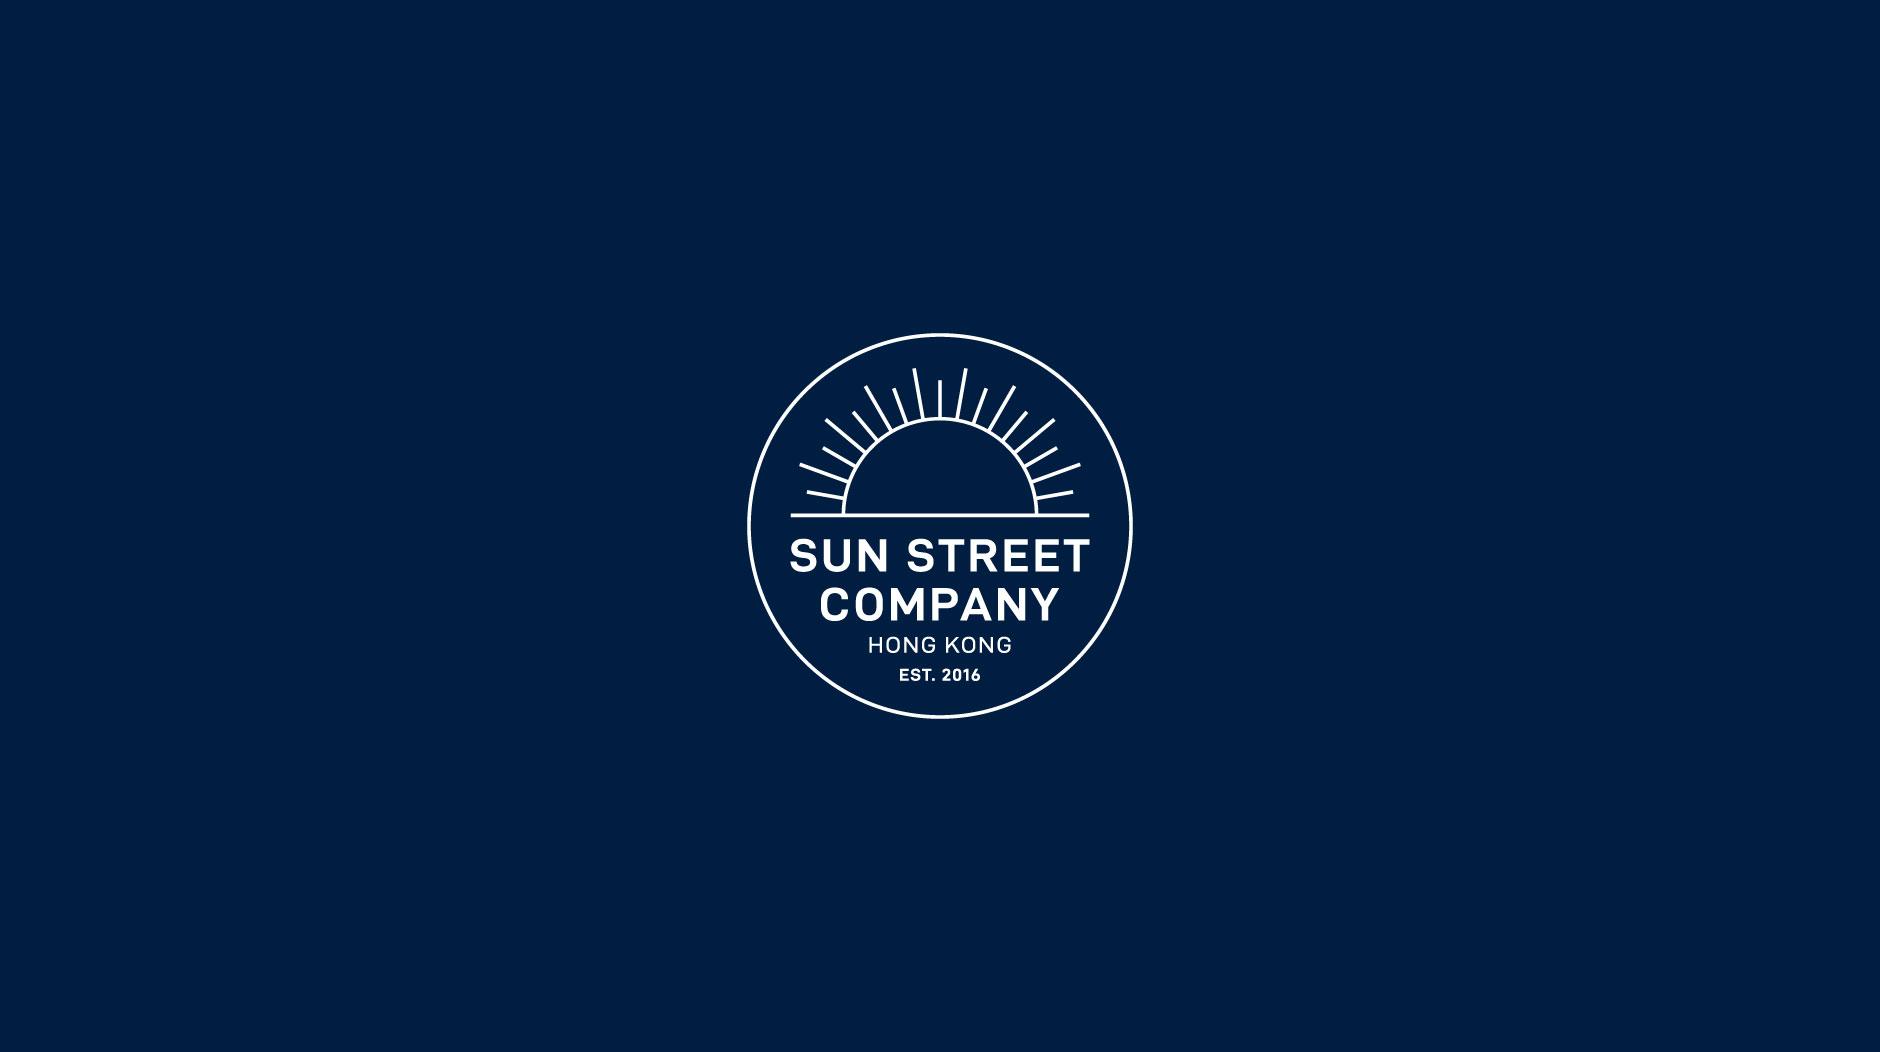 Sun Street white logo lockup on a dark blue background